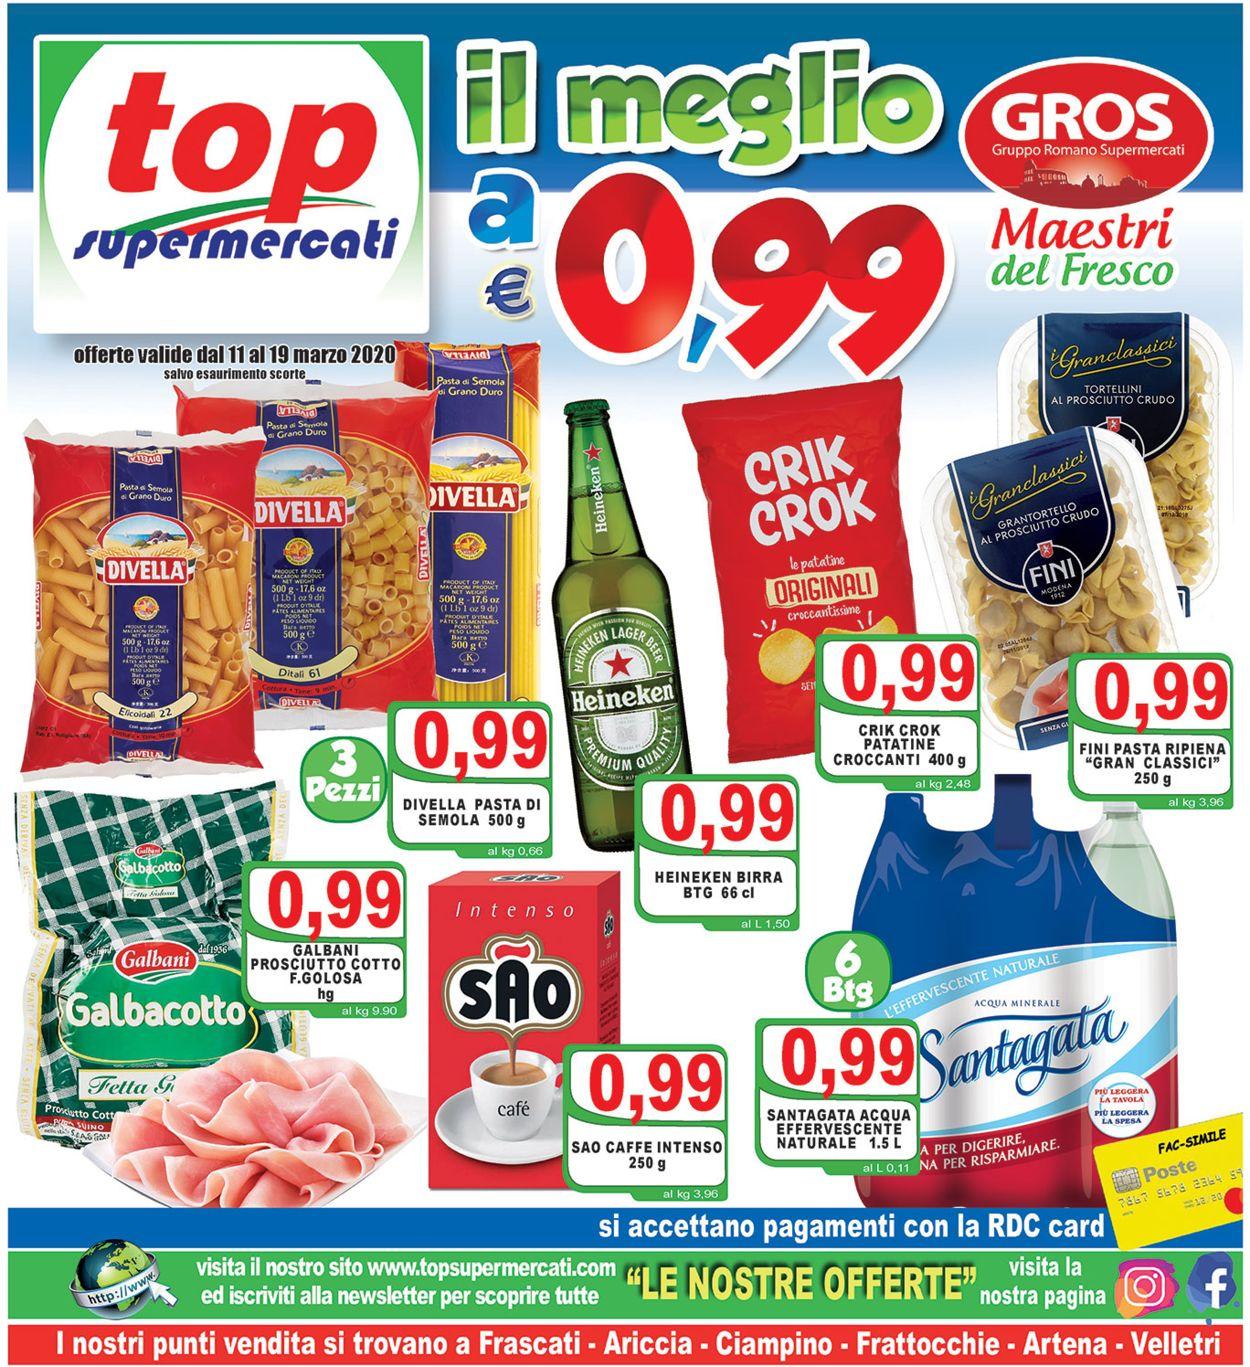 Volantino Top Supermercati - Offerte 11/03-19/03/2020